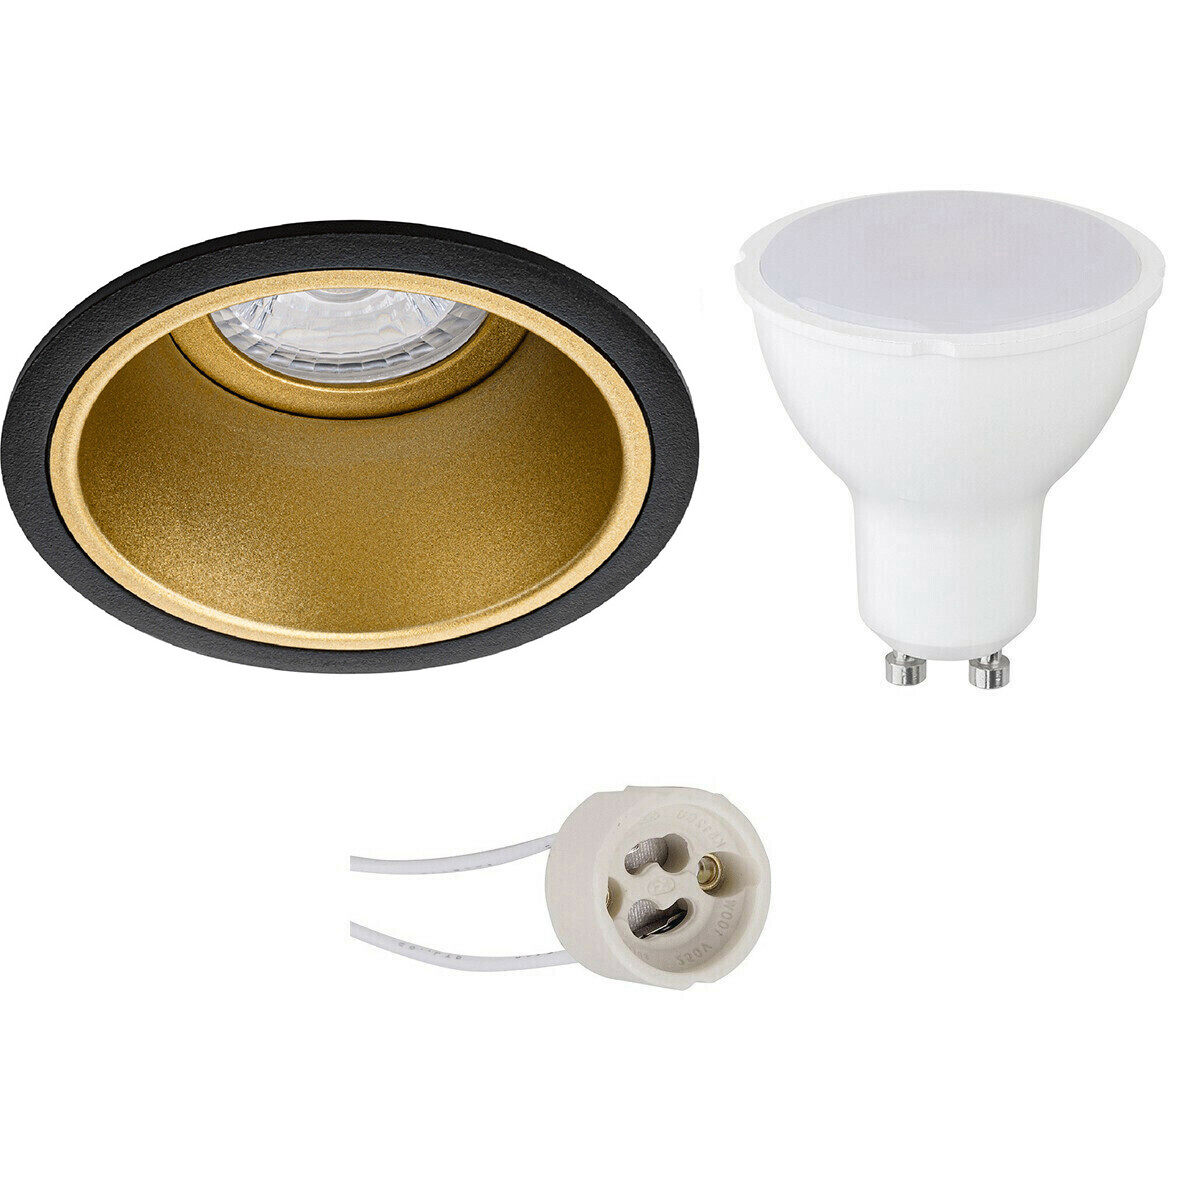 LED Spot Set - Aigi - Pragmi Minko Pro - GU10 Fitting - Inbouw Rond - Mat Zwart/Goud - 8W - Helder/K